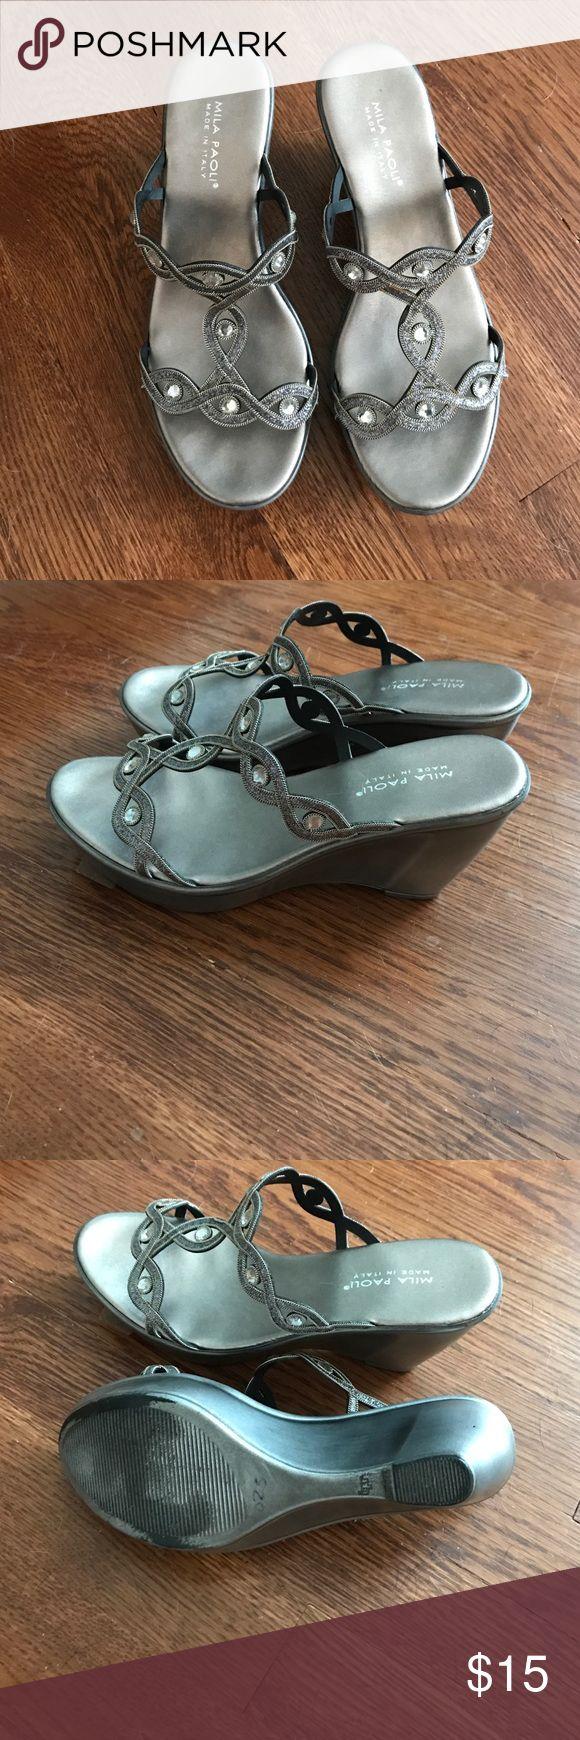 Elegant wedge sandal Beautiful silver wedge sandals with rhinestones. mila paoli Shoes Wedges